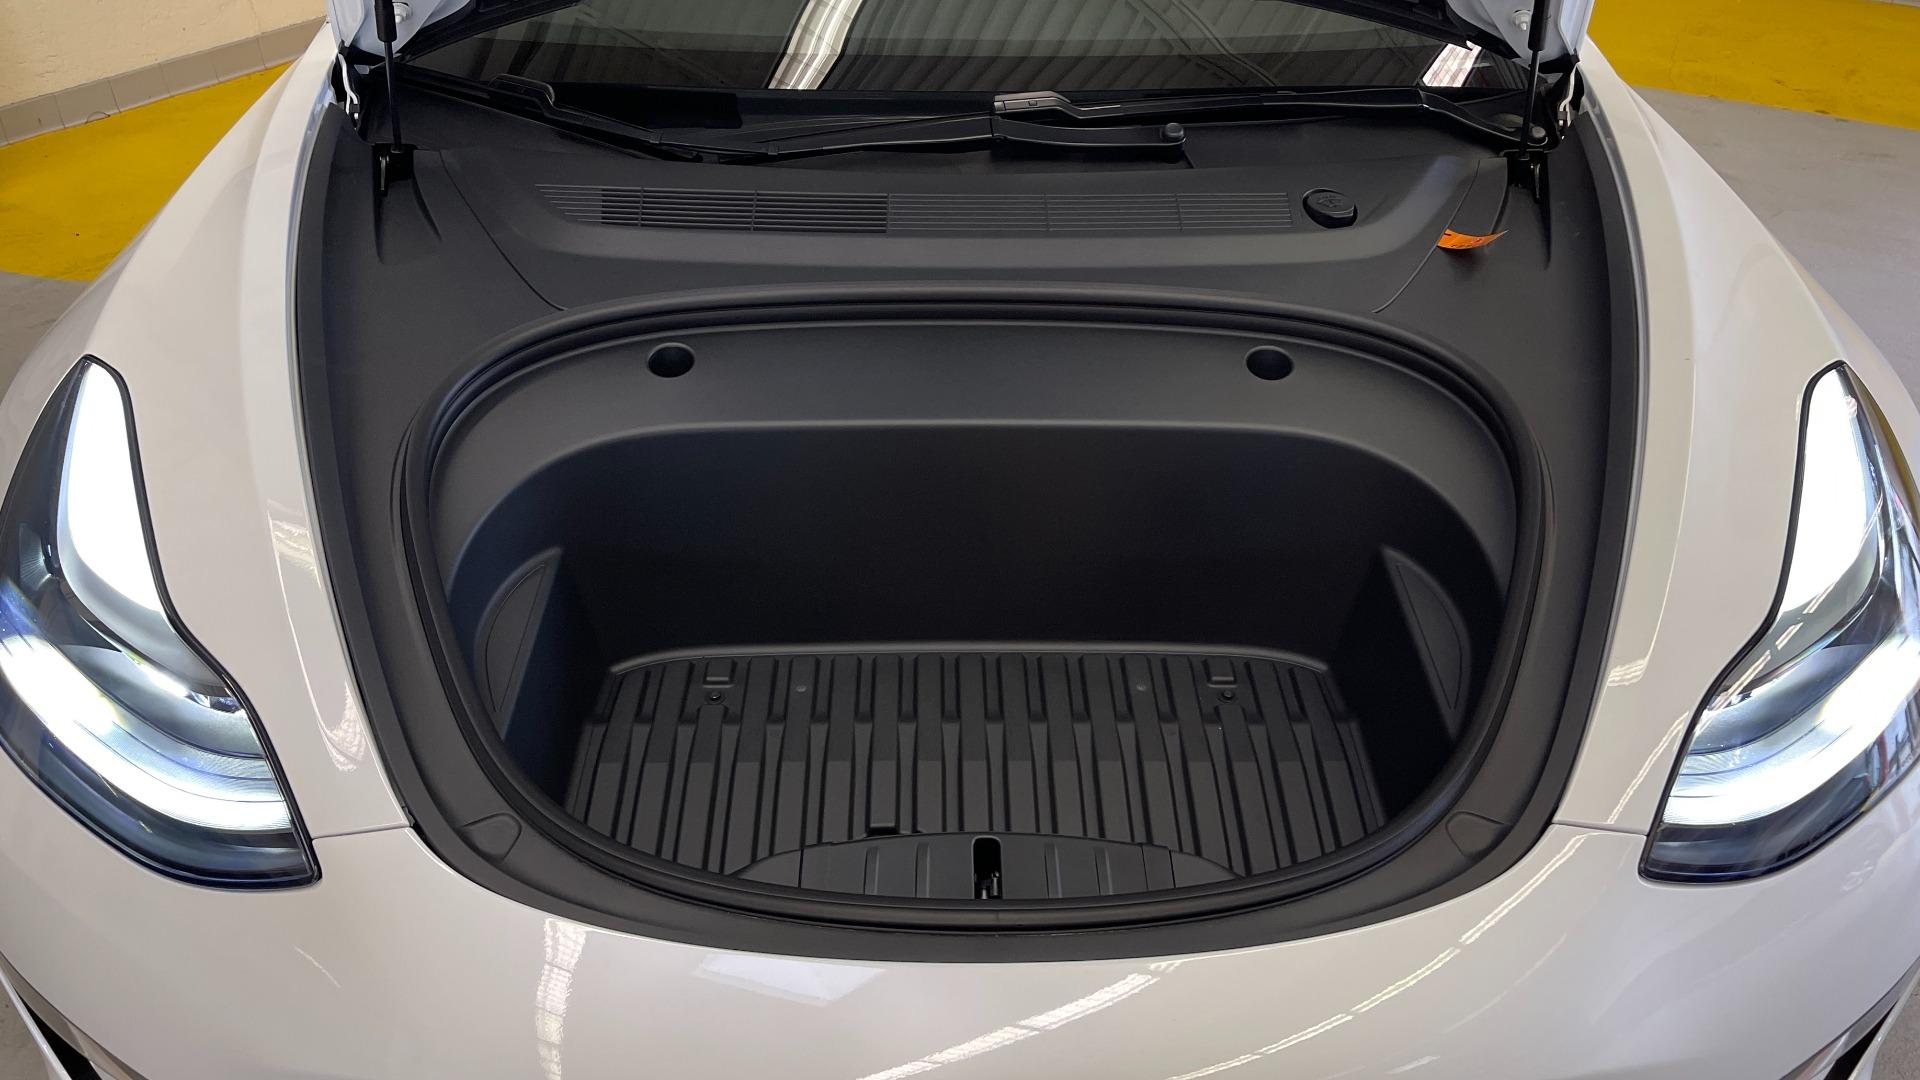 Used 2021 Tesla MODEL 3 STANDARD RANGE PLUS / NAV / REARVIEW for sale $49,595 at Formula Imports in Charlotte NC 28227 5